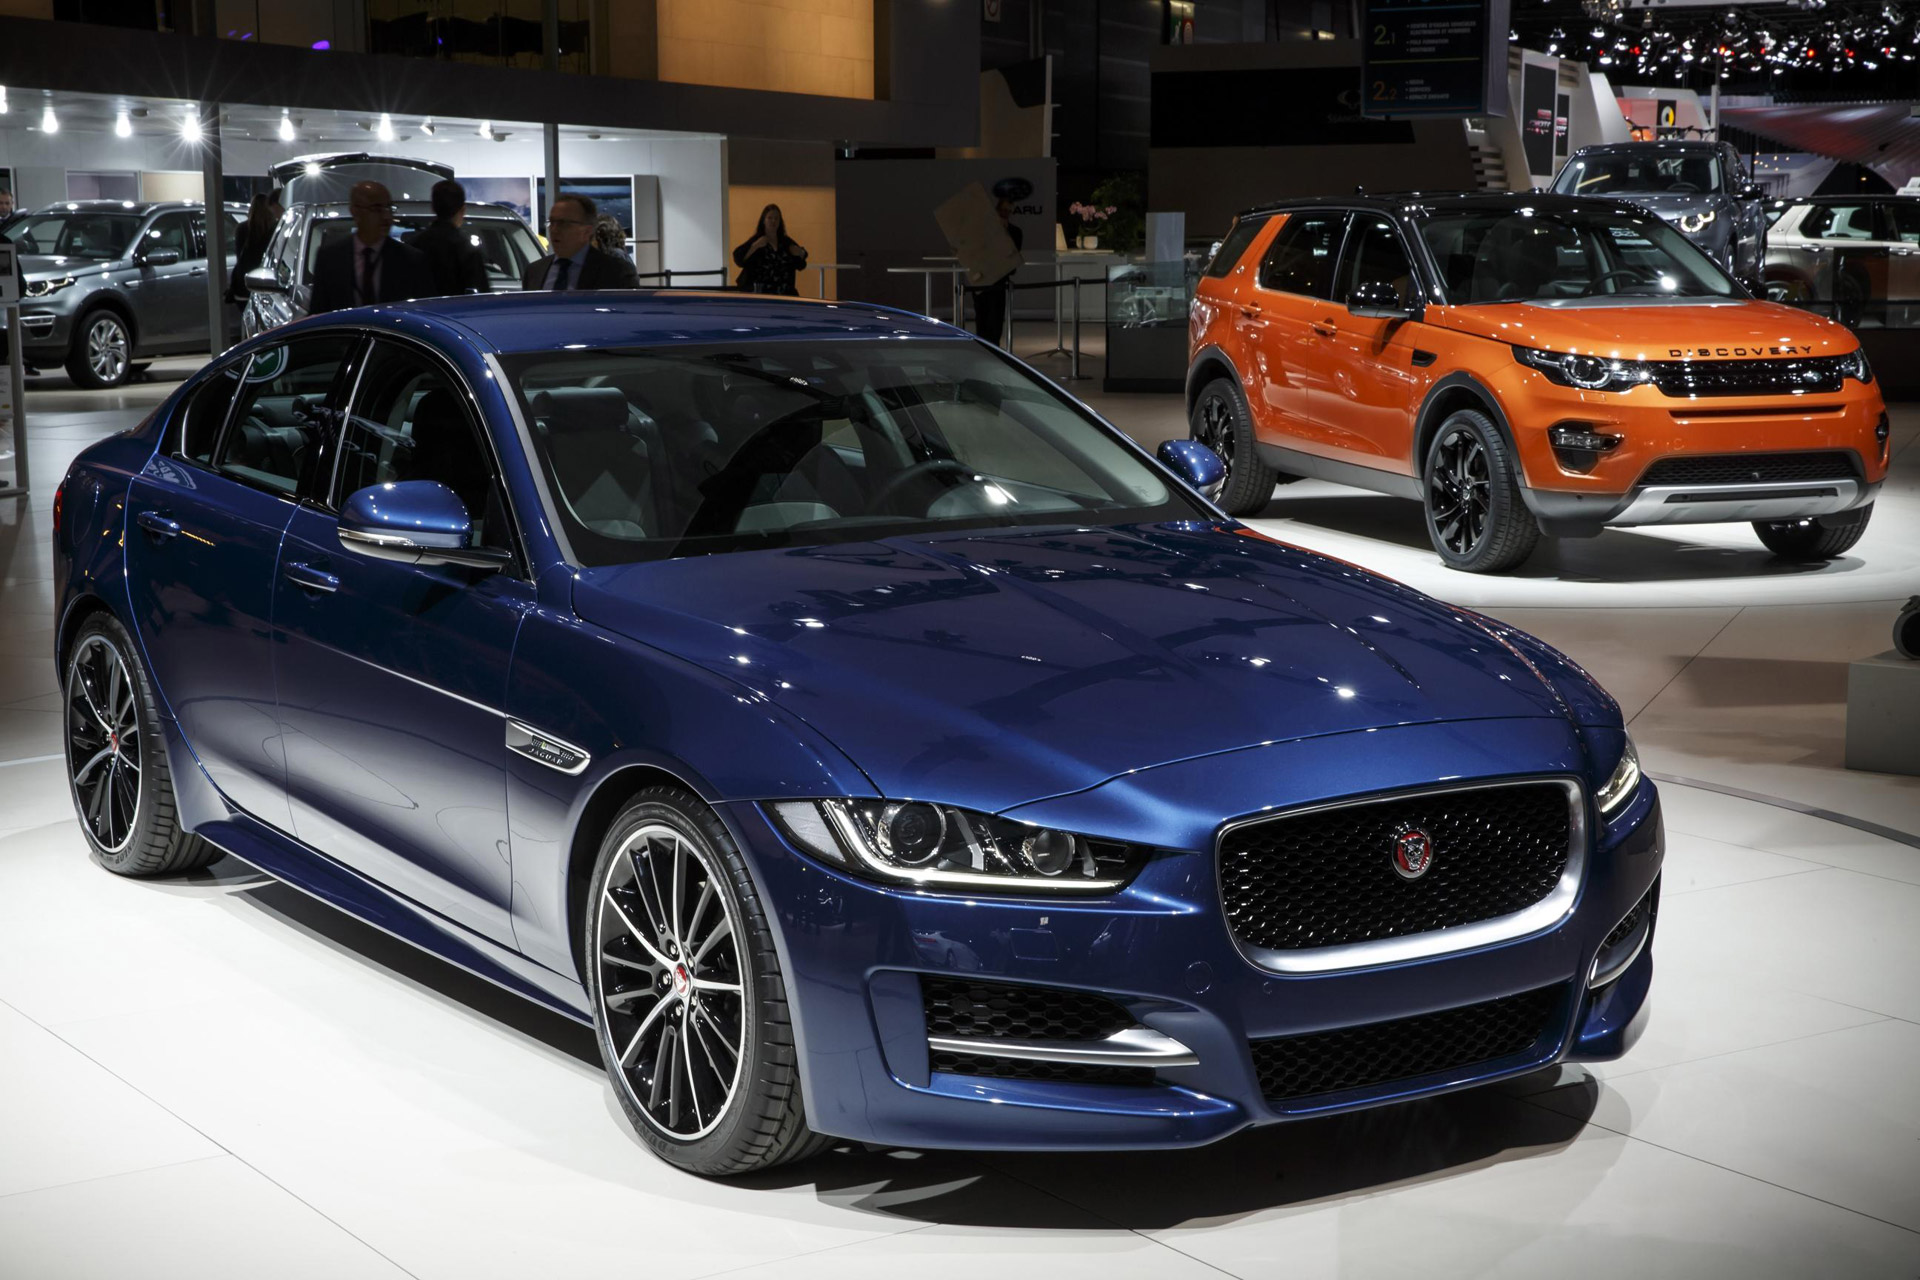 turbo comprehensive jaguar interior side sedan front autocolumn jlr rear review petrol xf